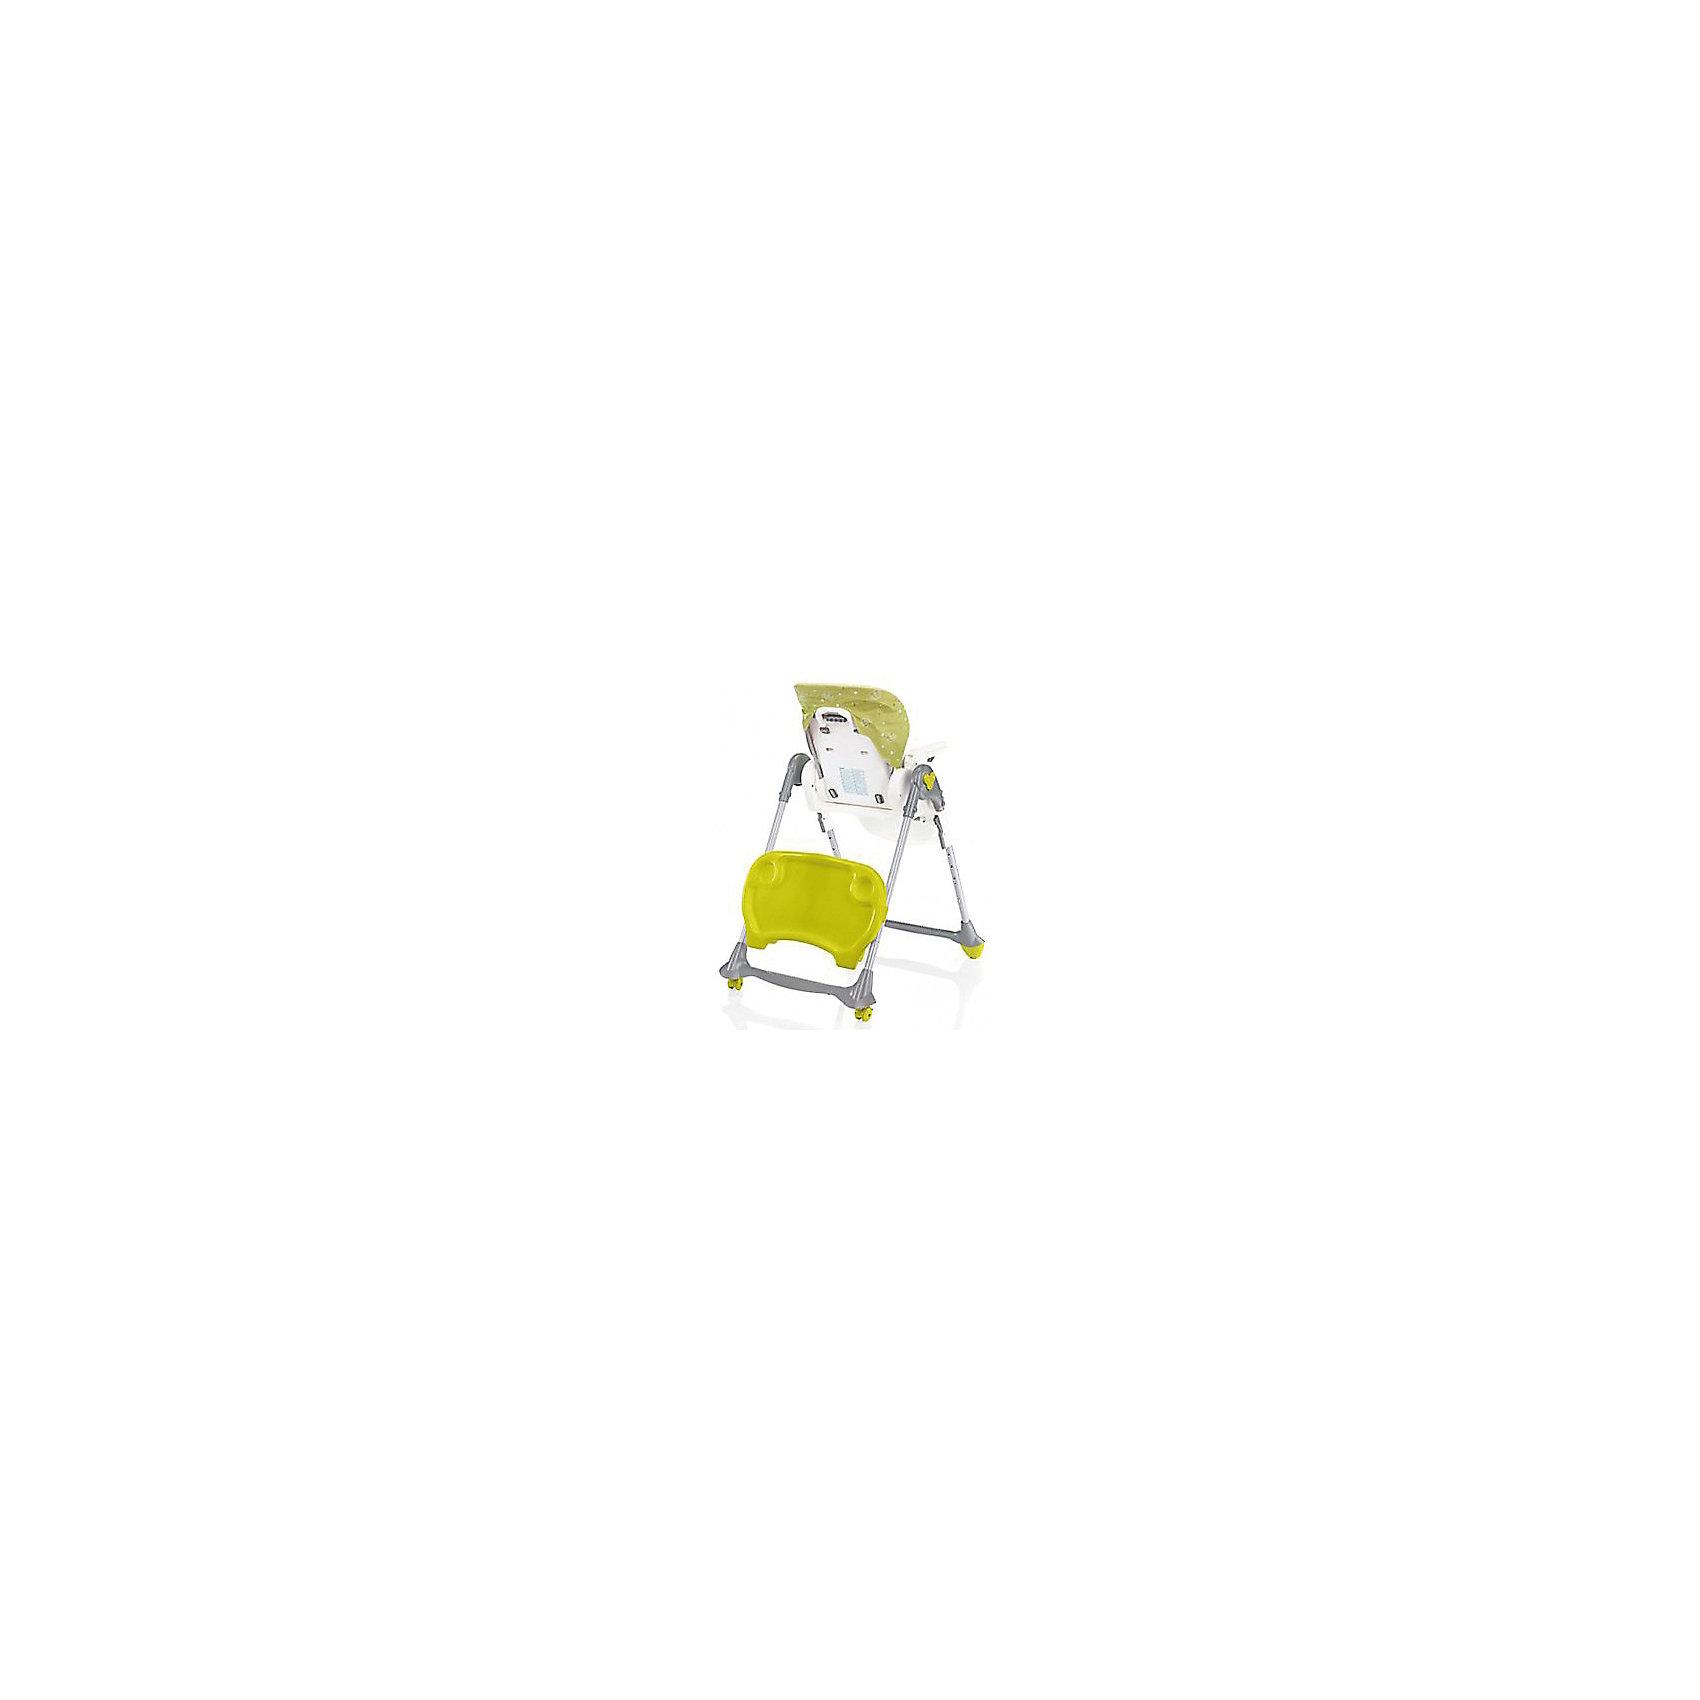 Стульчик для кормления Convivio, Brevi, серый-белый (brevi)